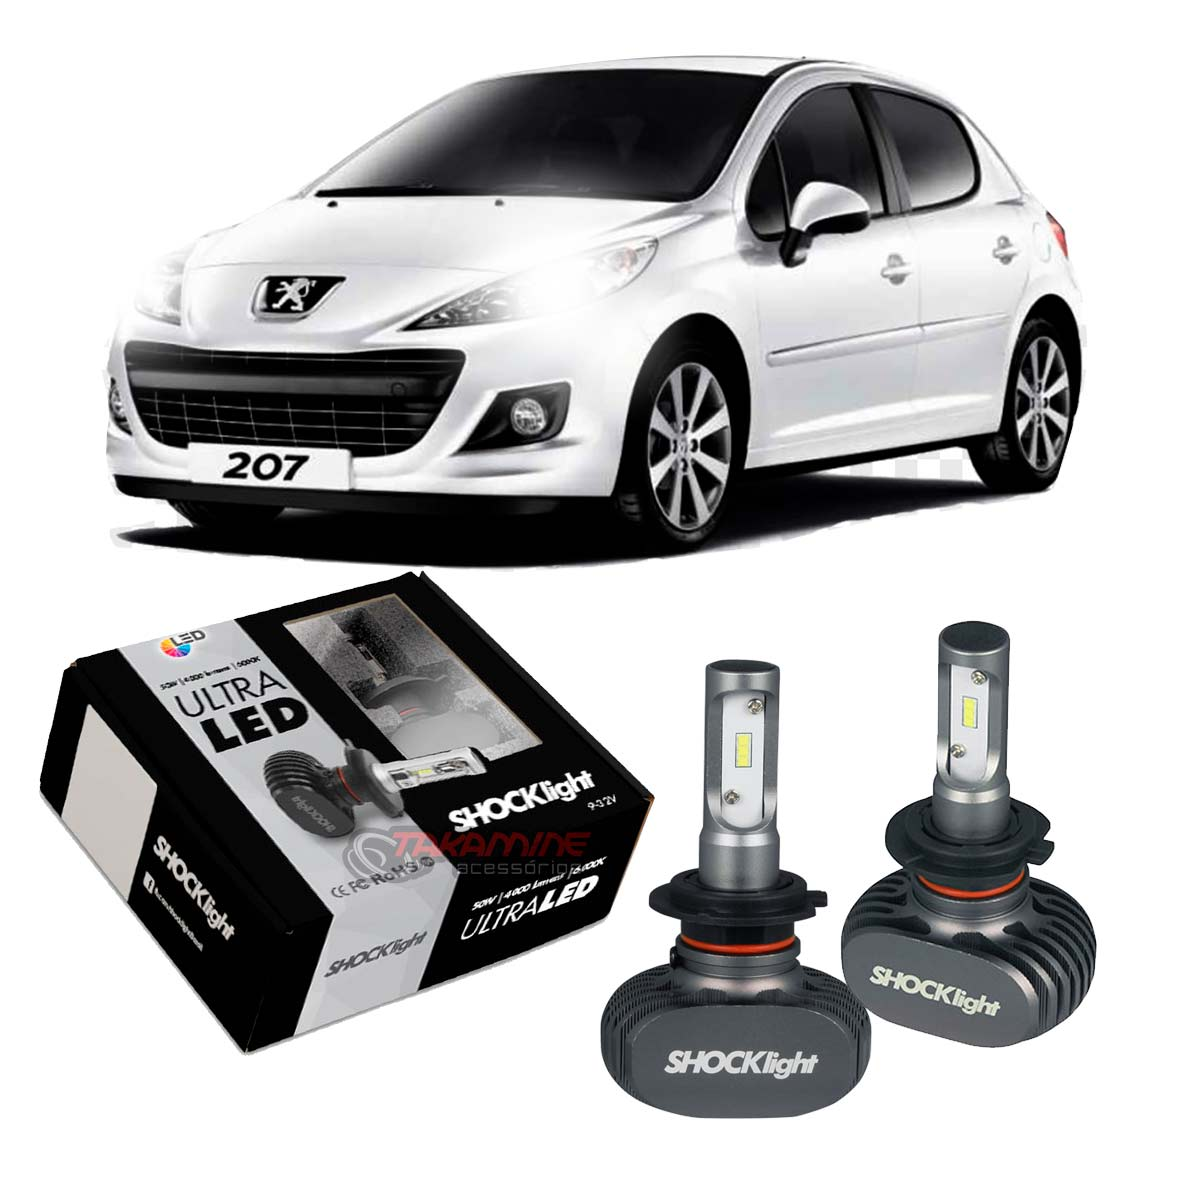 Kit Ultra LED Peugeot 207 2008 até 2015 tipo xenon farol baixo H7 50W